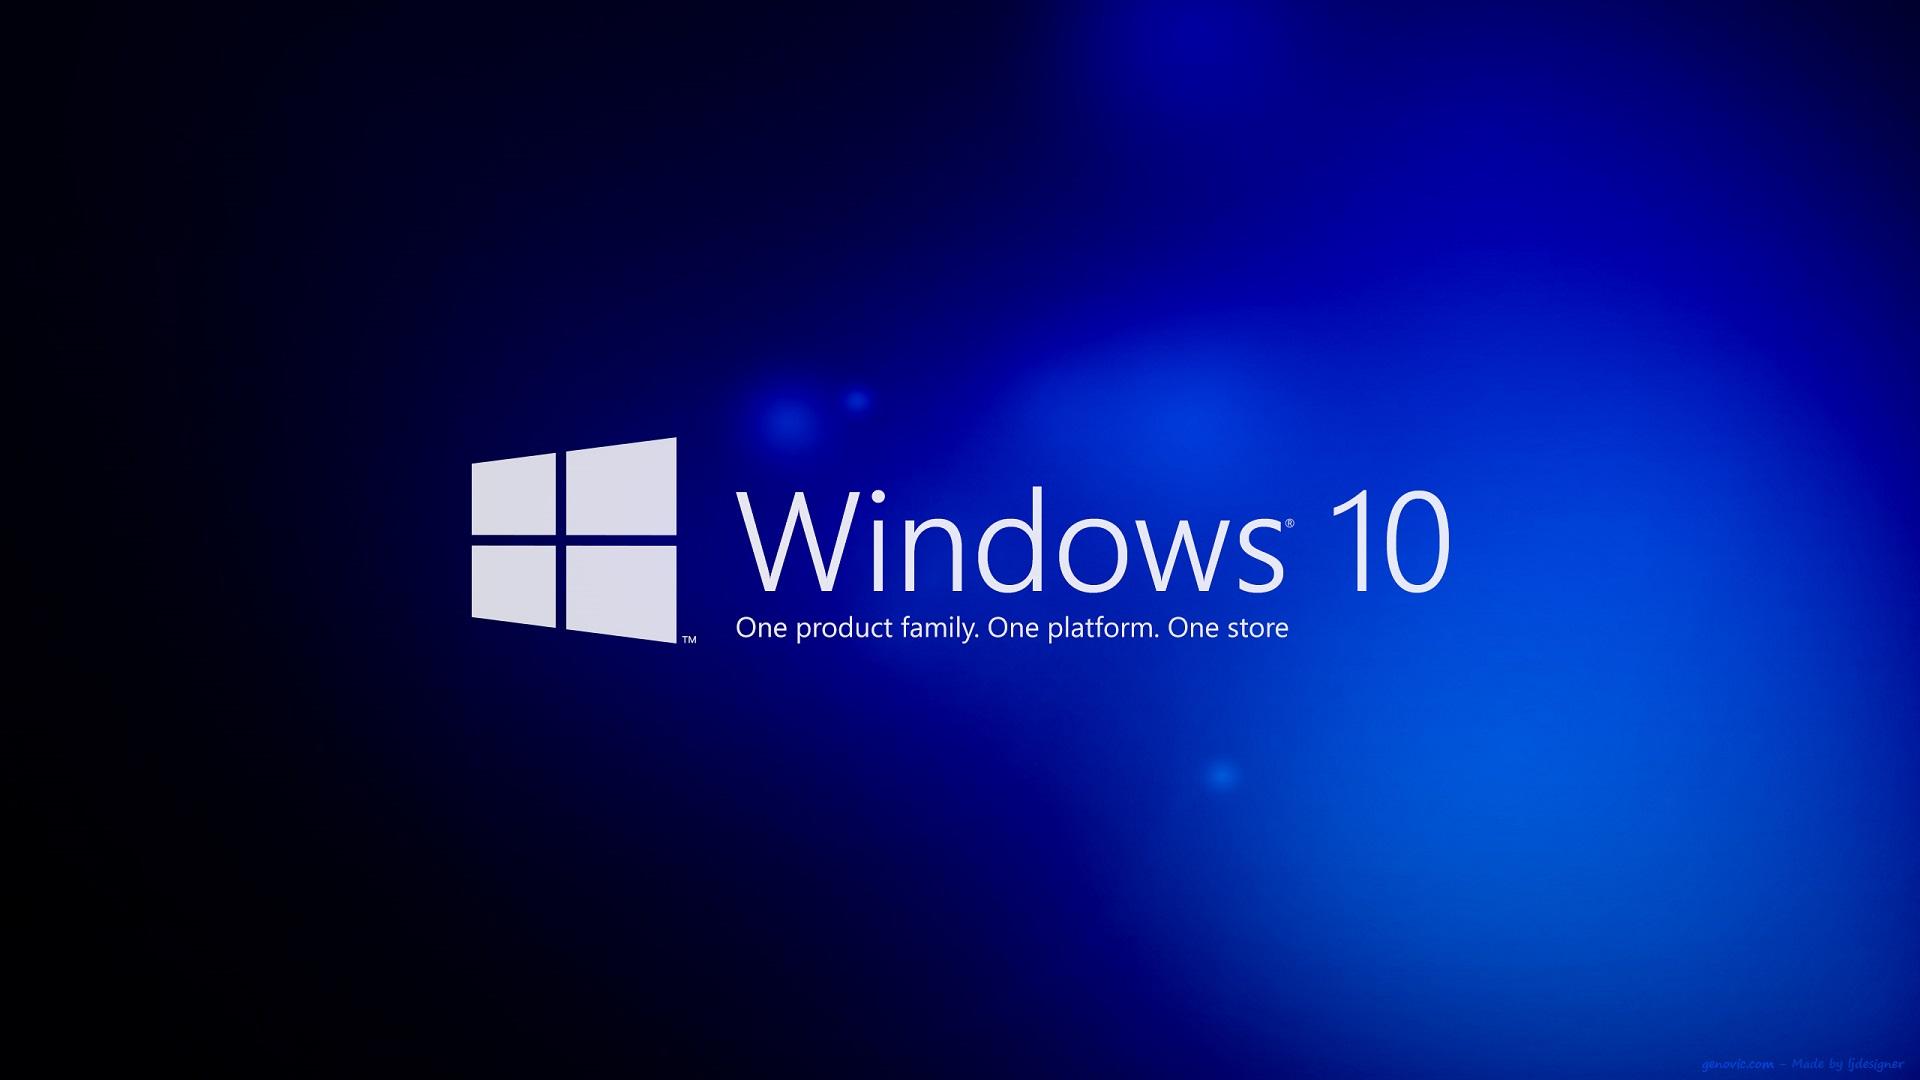 Windows 10 HD wallpapersjpg 1920x1080